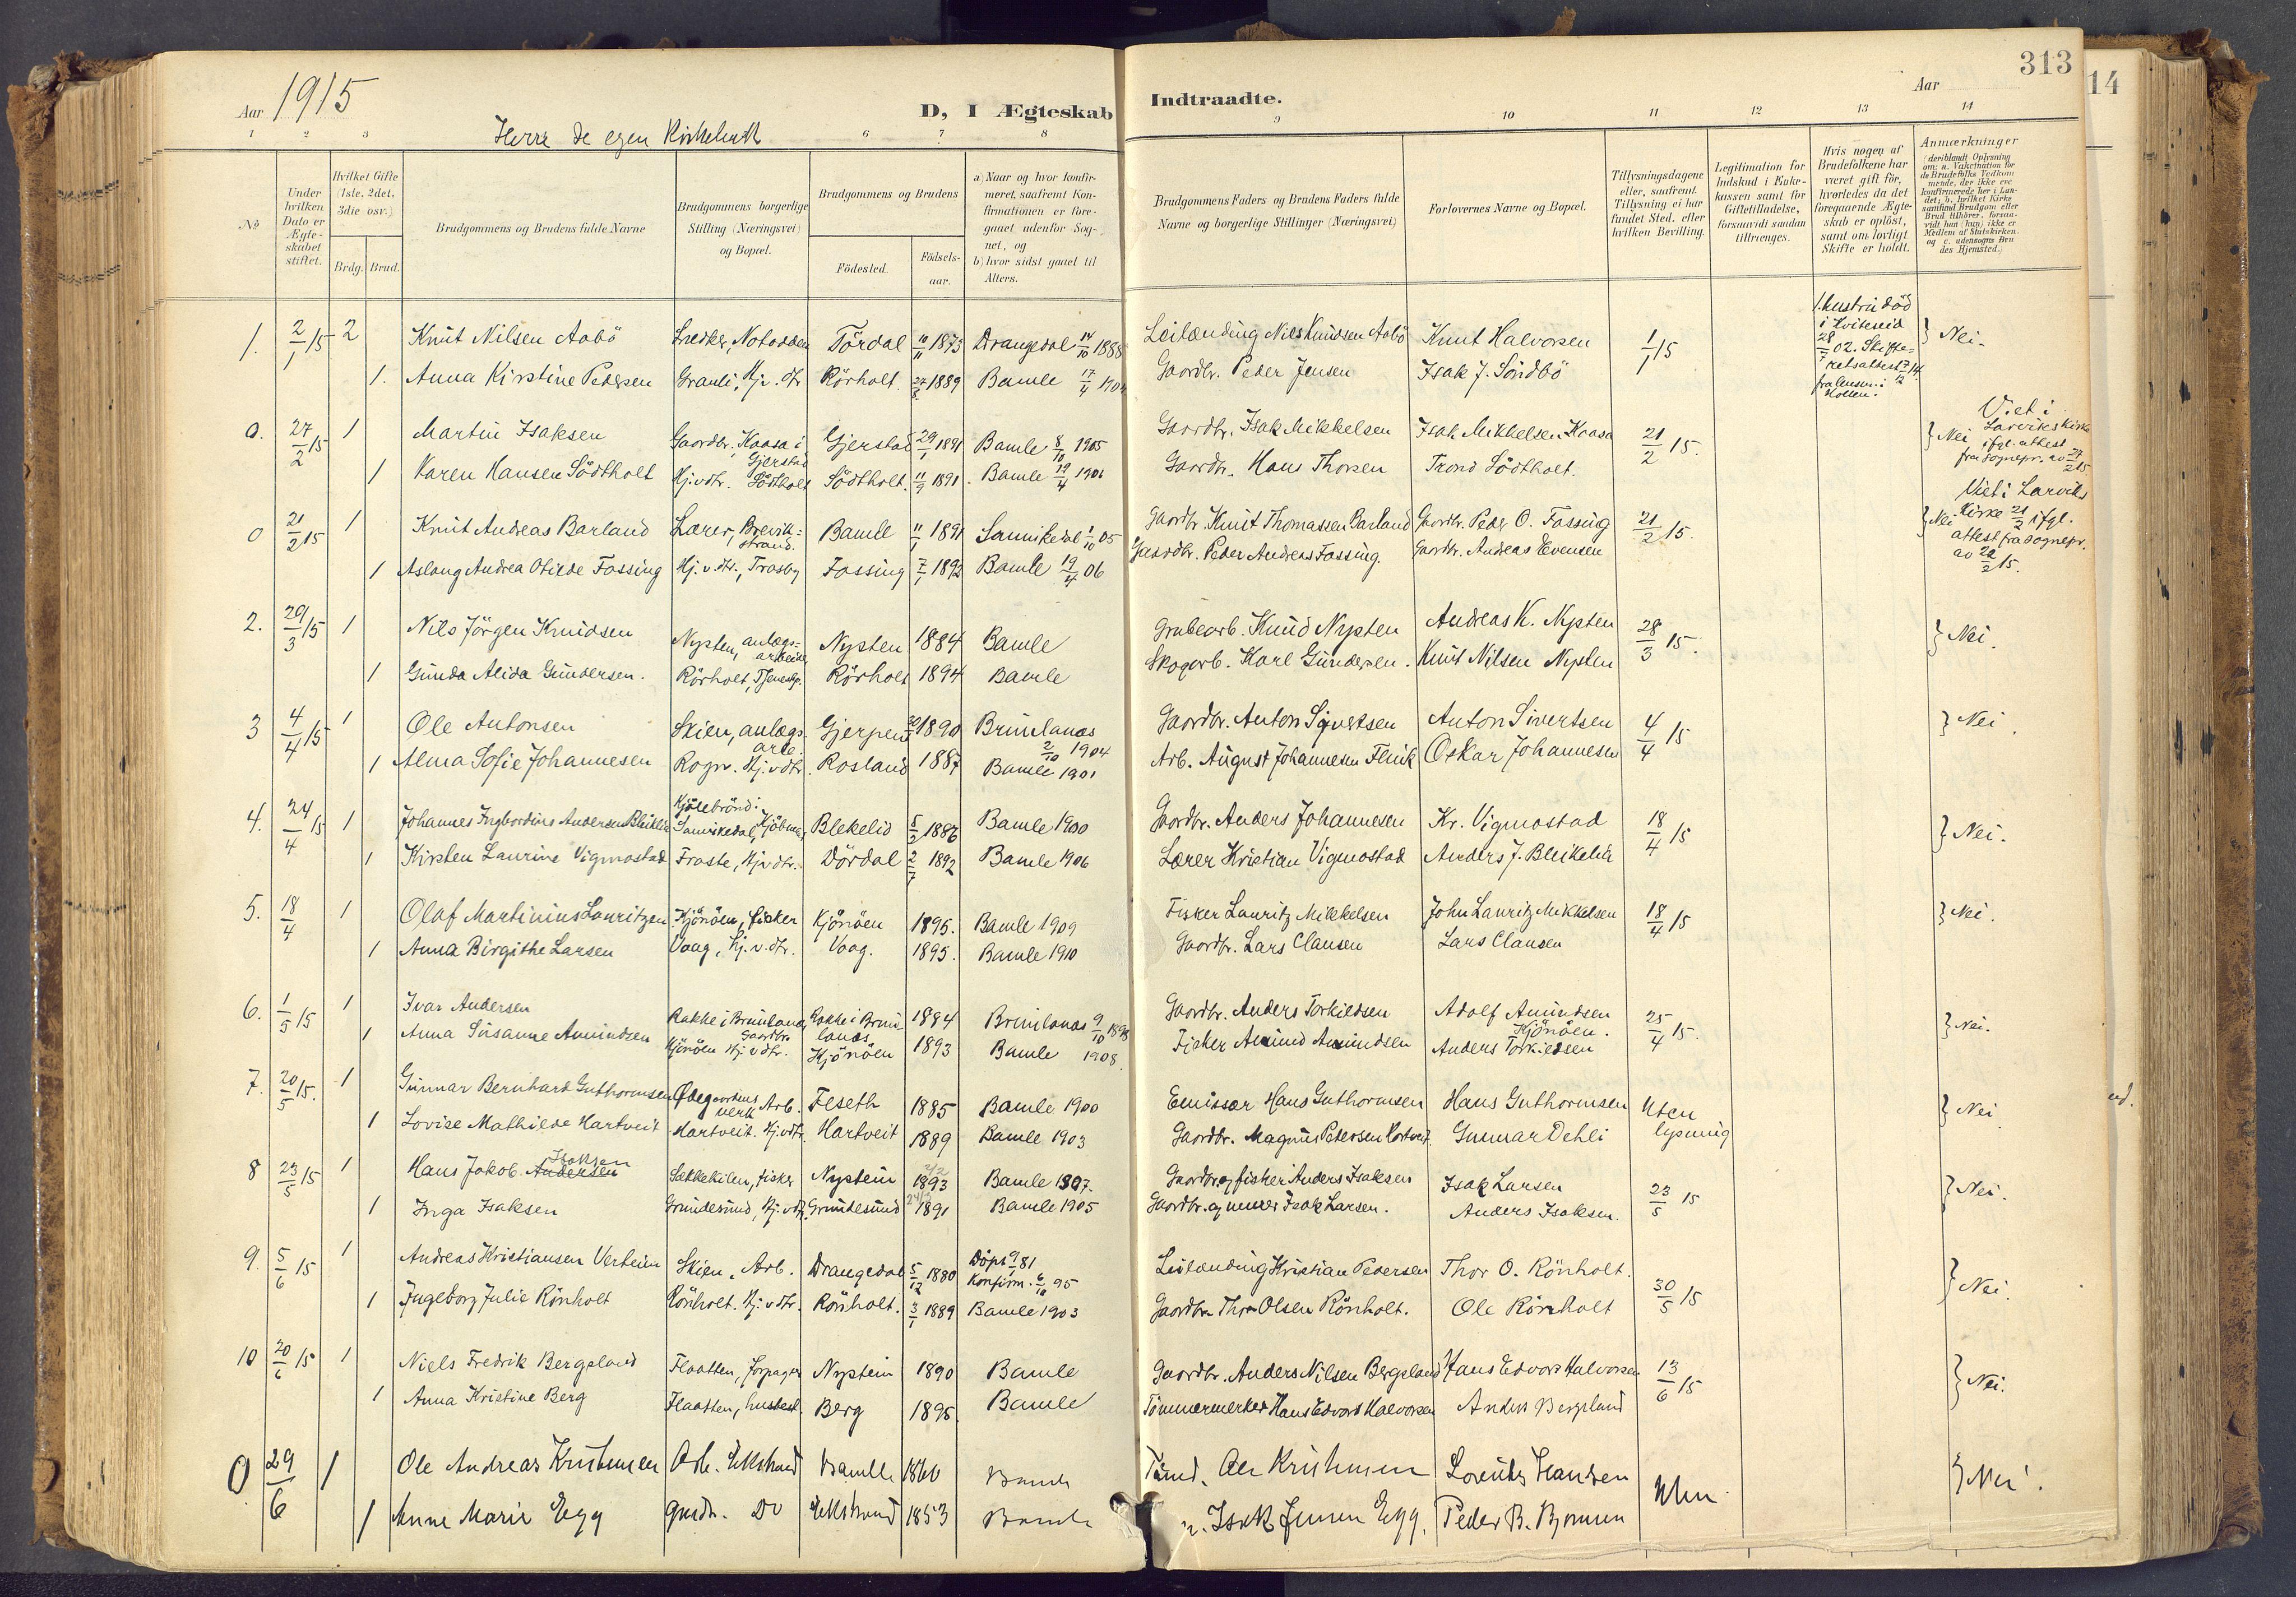 SAKO, Bamble kirkebøker, F/Fa/L0009: Ministerialbok nr. I 9, 1901-1917, s. 313